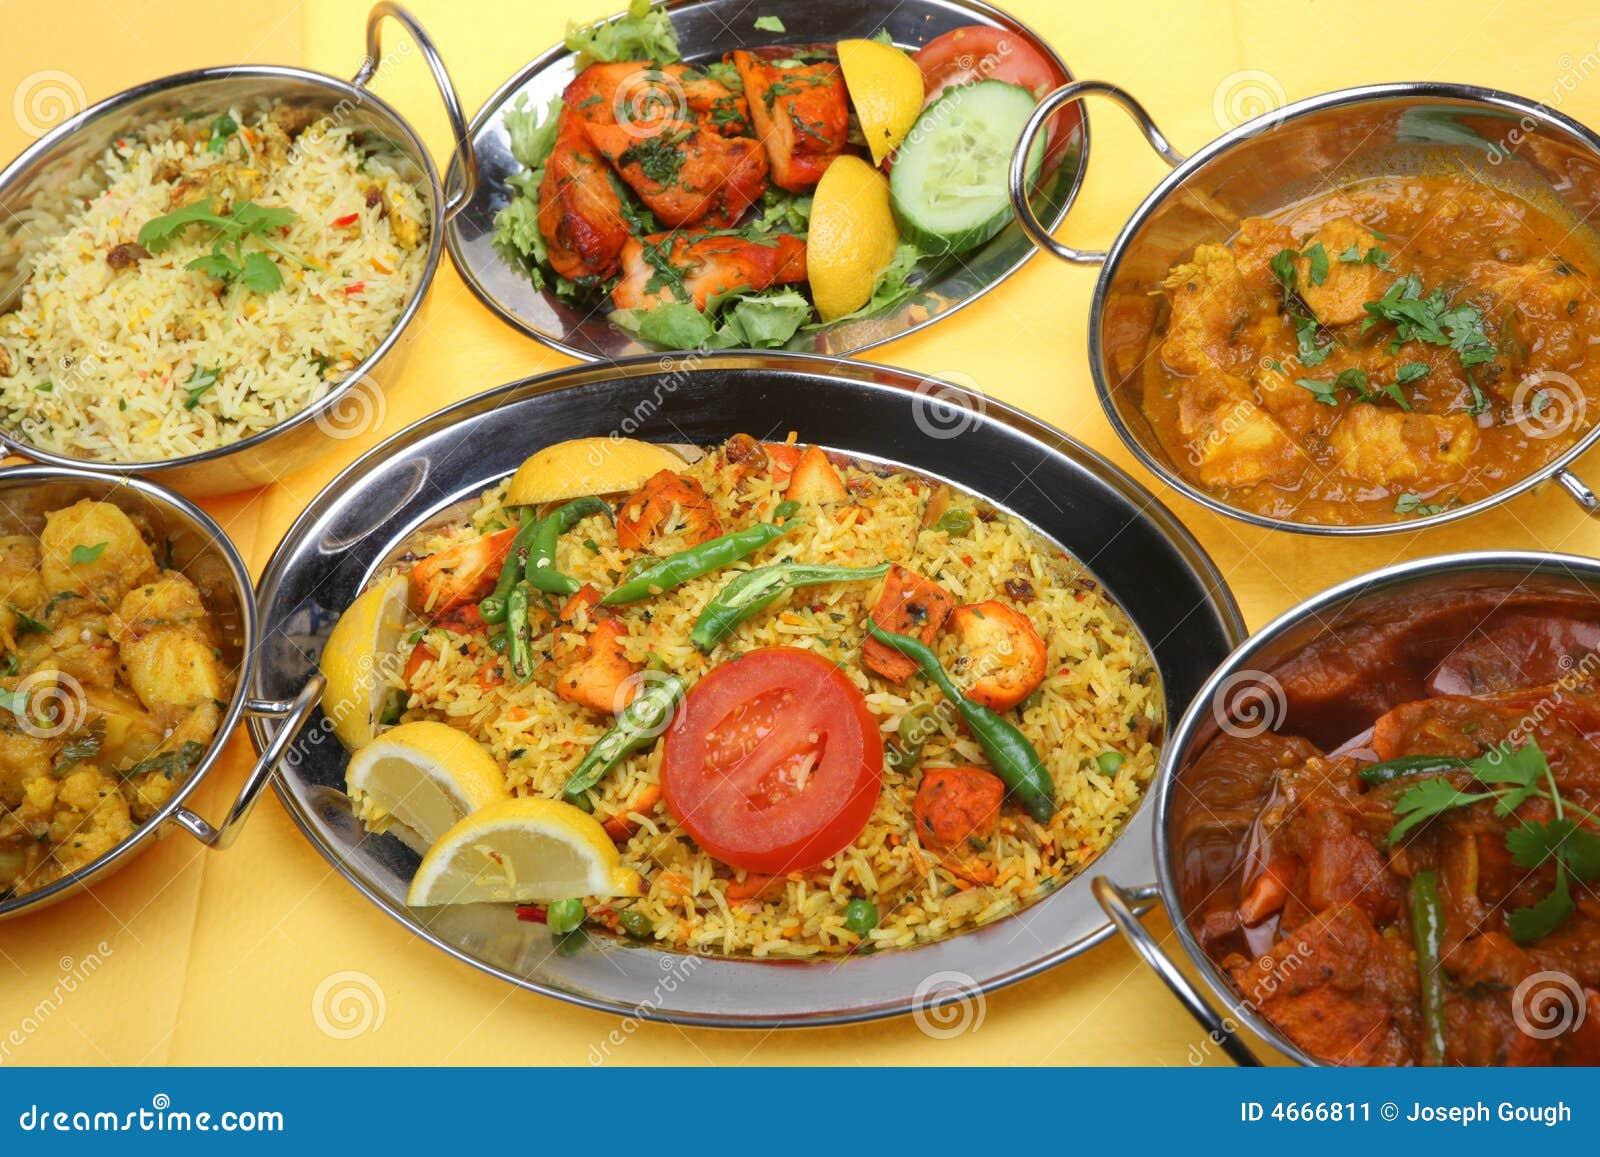 Indian Summer Restaurant Dubai Menu